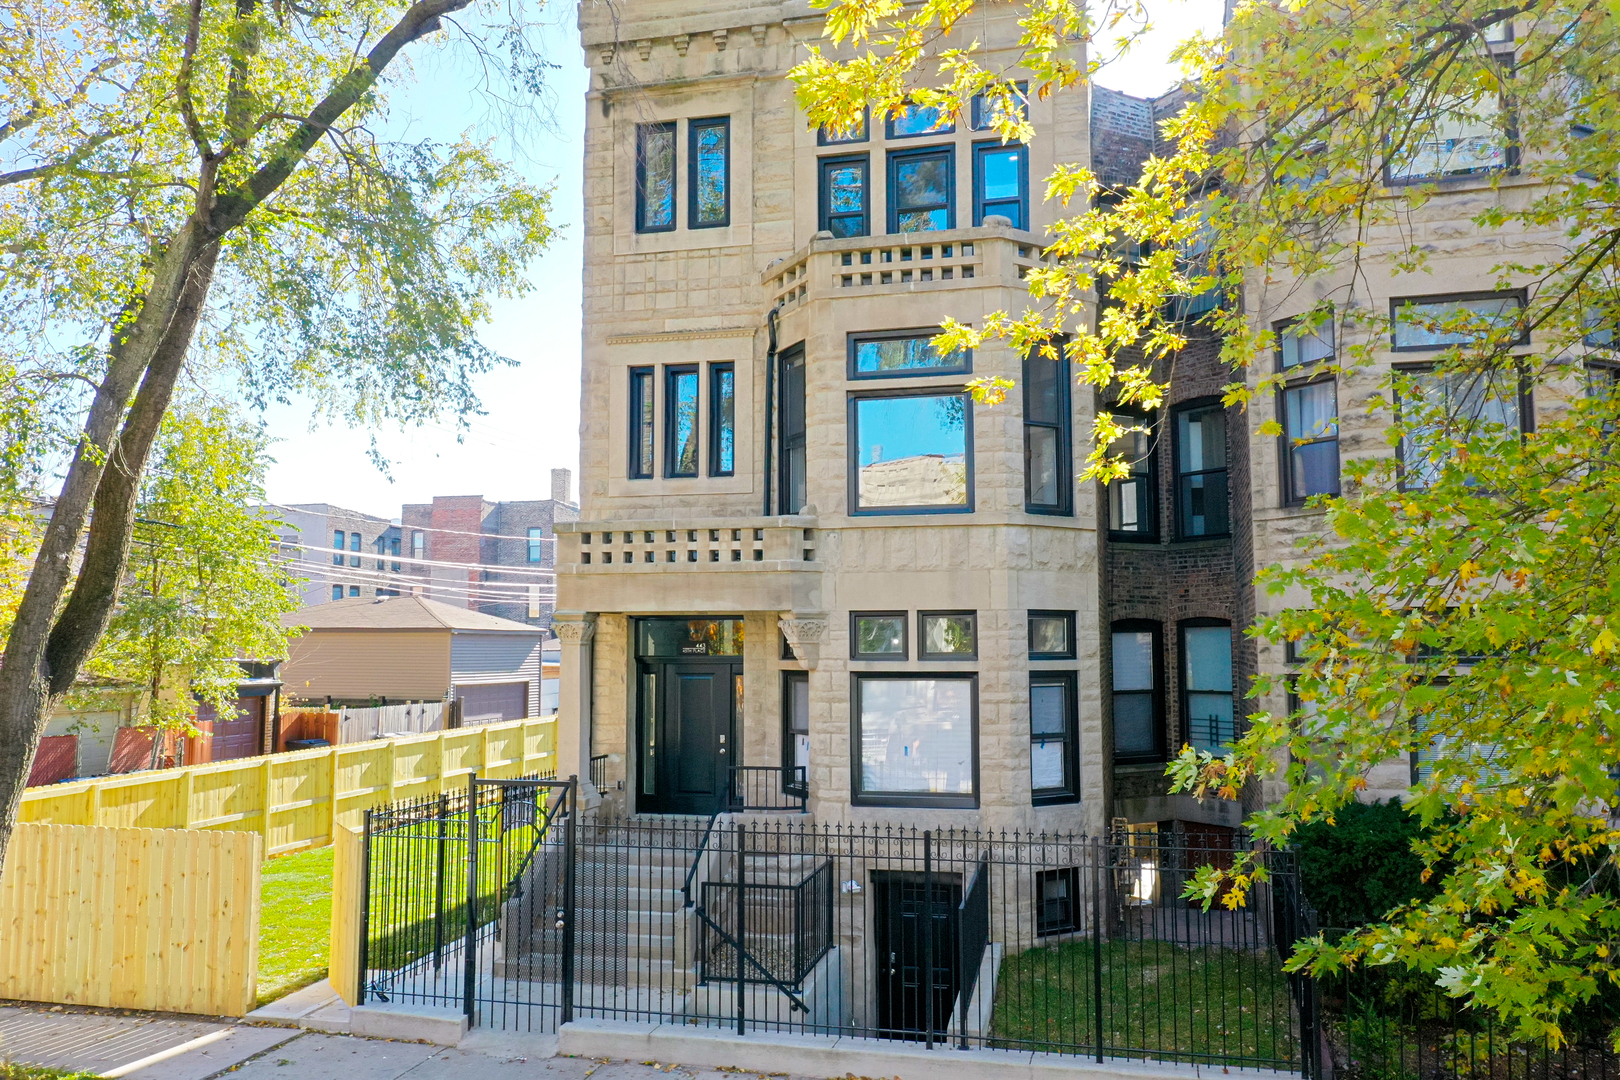 443 45th Unit Unit 1 ,Chicago, Illinois 60653